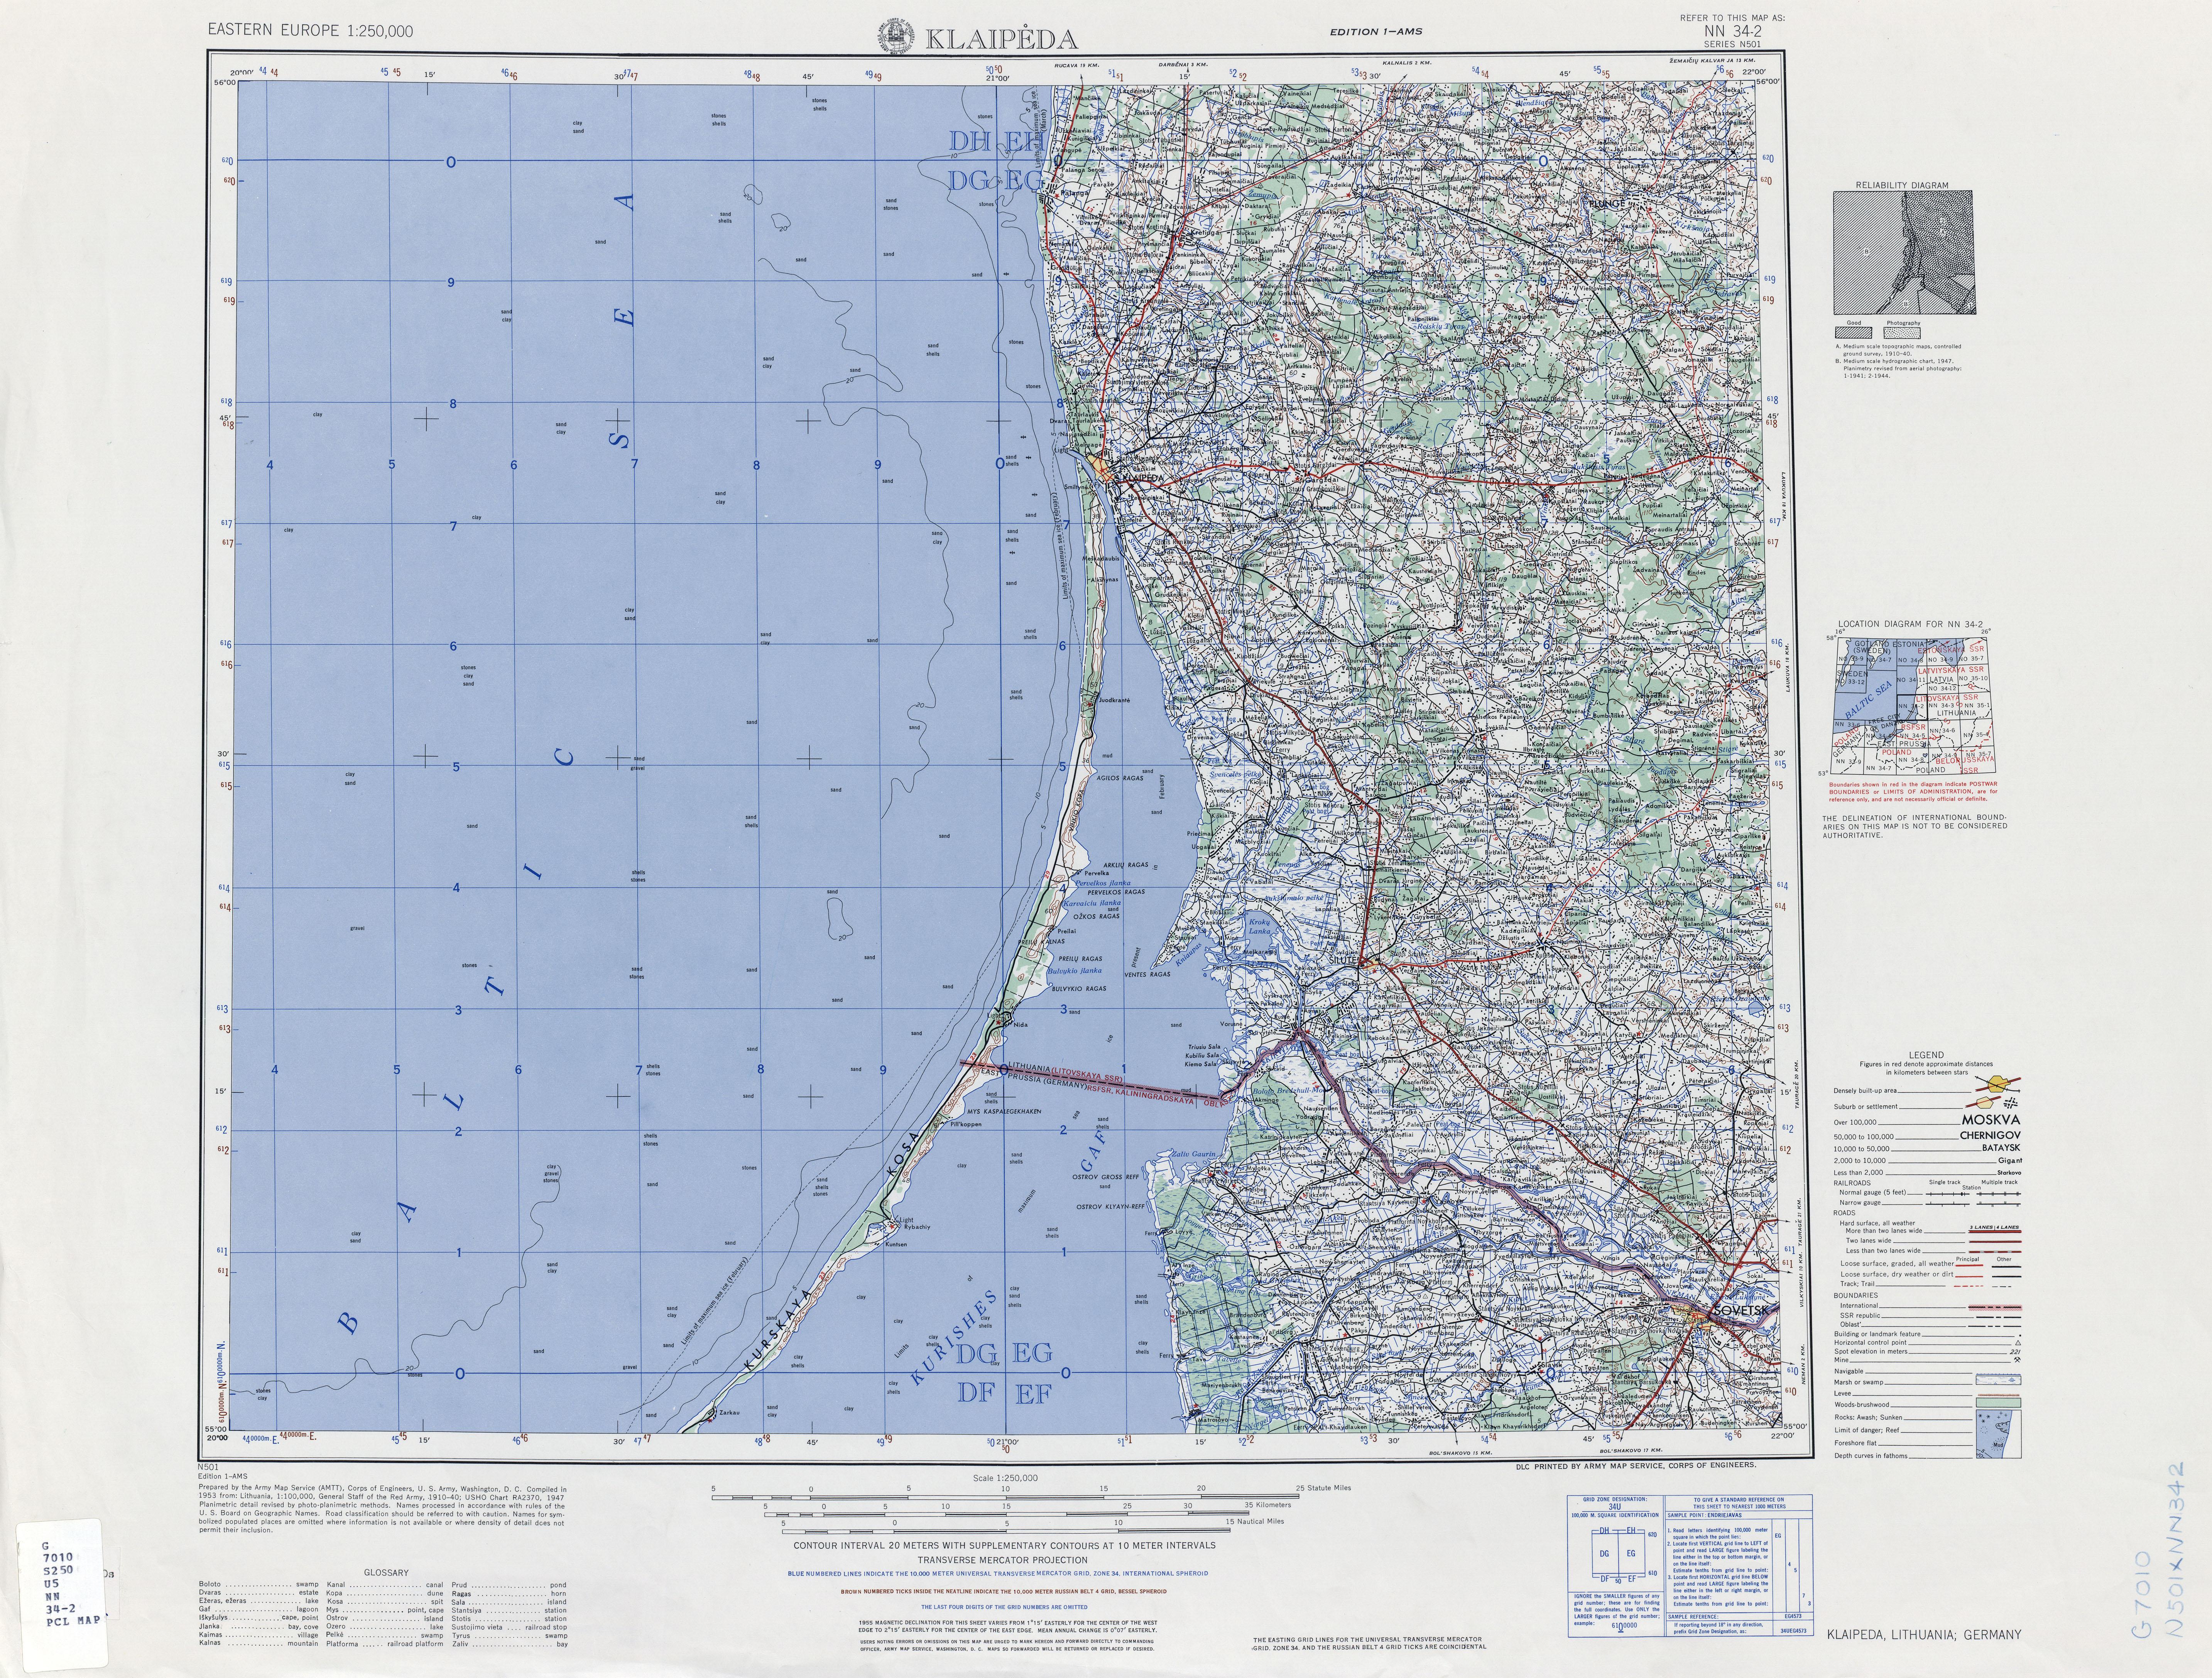 FileUSSR map NN 342 Klaipedajpg Wikimedia Commons